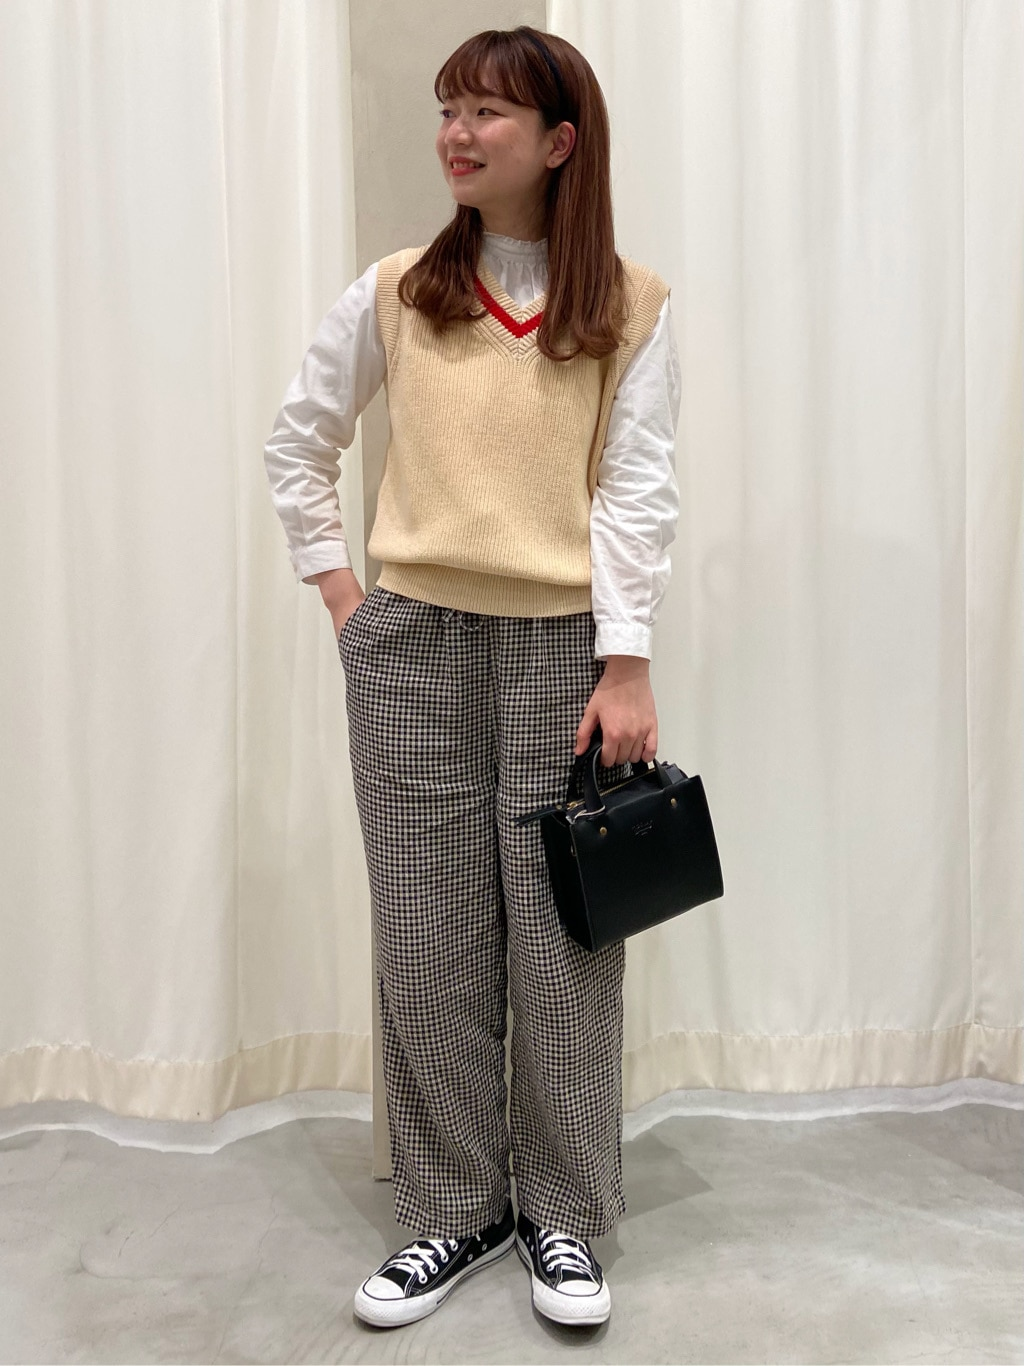 CHILD WOMAN , PAR ICI 東京スカイツリータウン・ソラマチ 2021.02.10